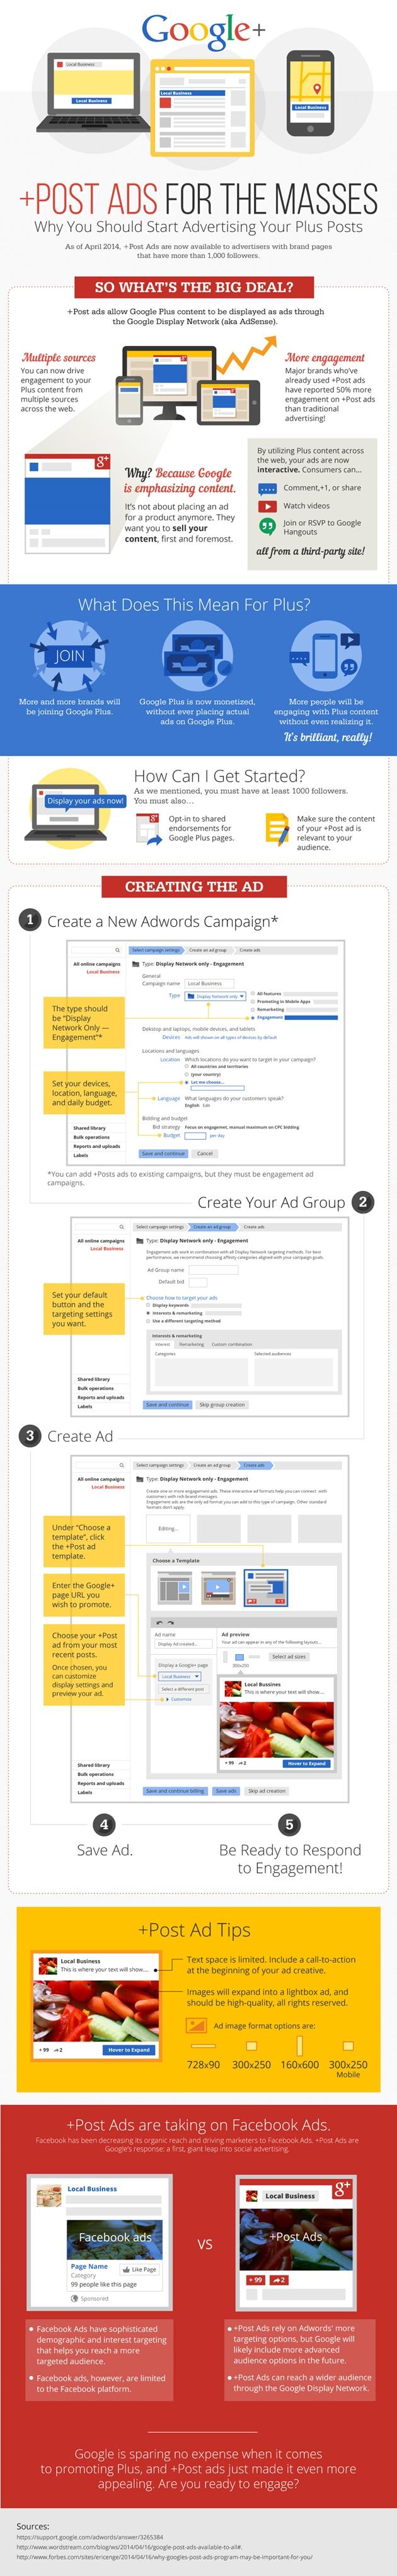 Google+PostAds Infographic